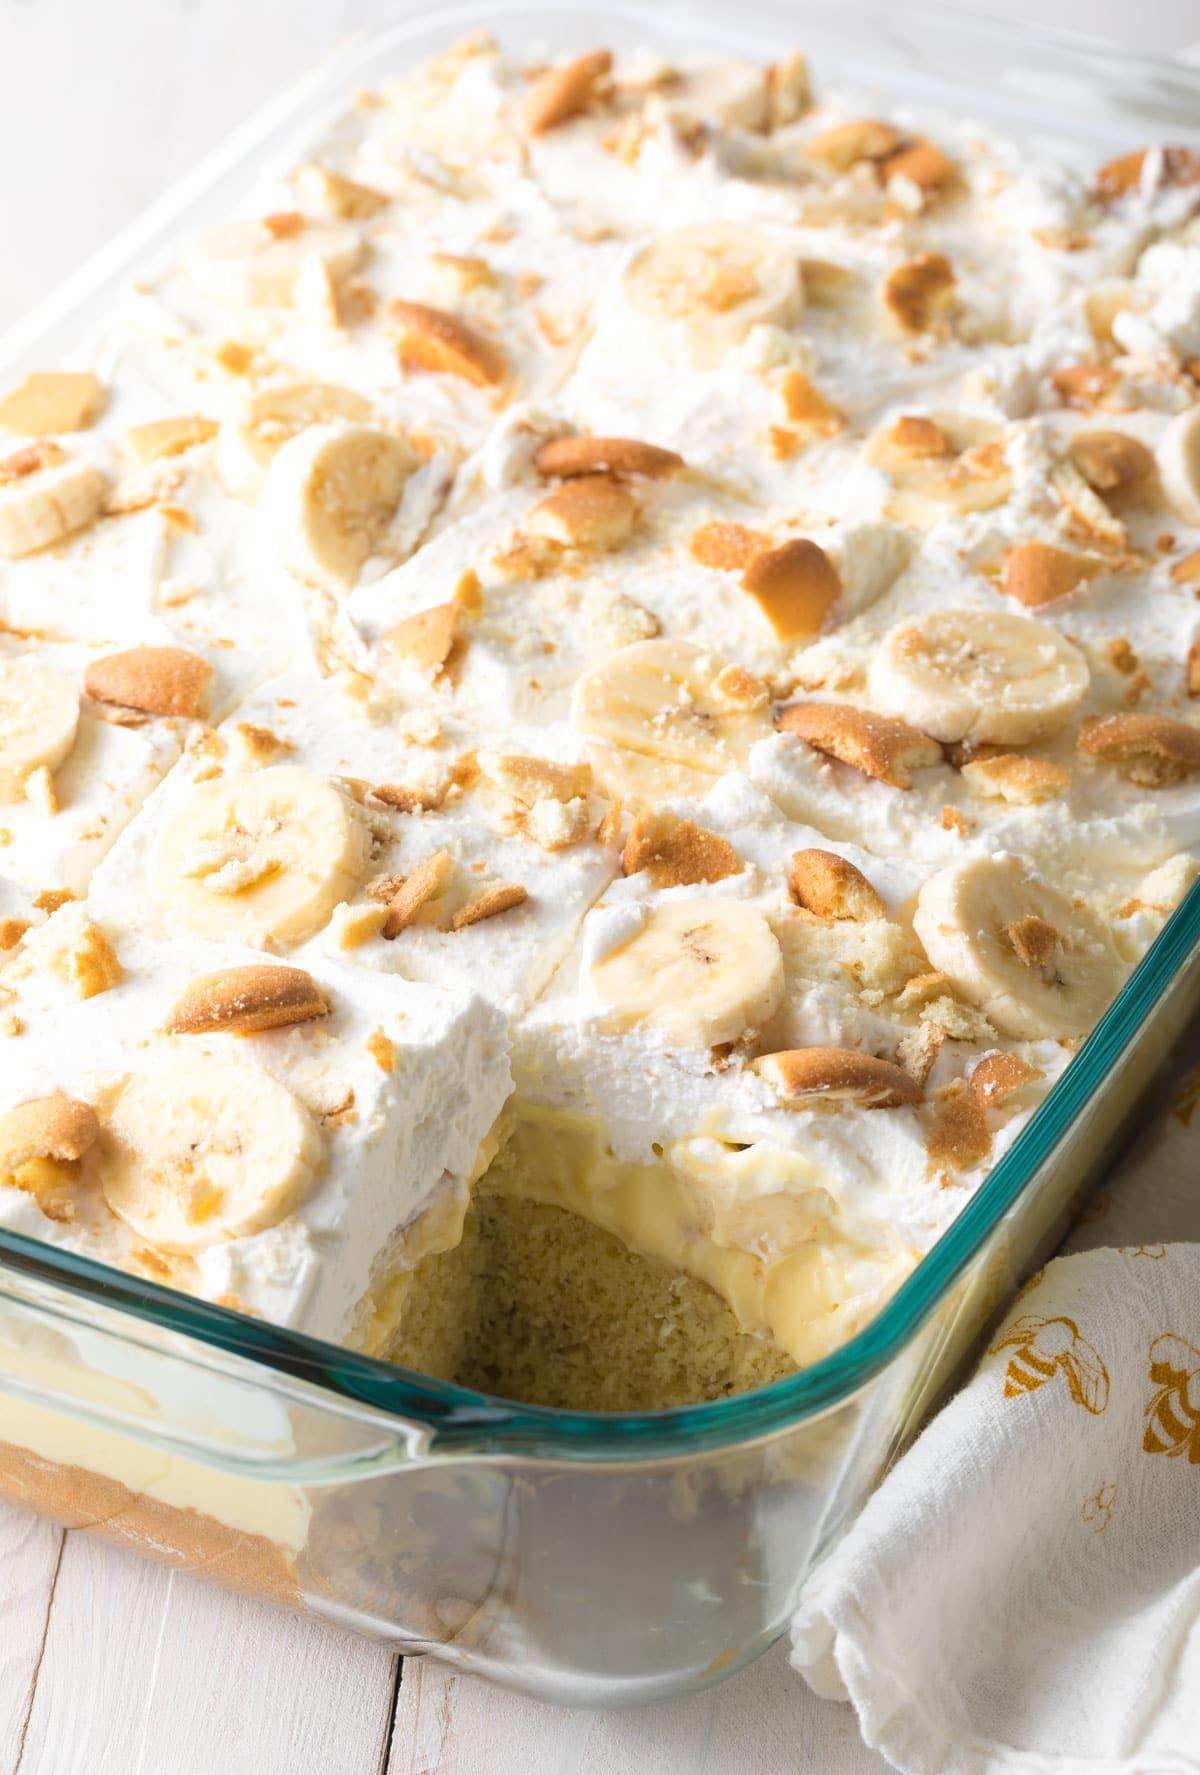 cfb216206699 Fluffy Layered Banana Pudding Bake Recipe  ASpicyPerspective  easter   bananacake  spring  potluck